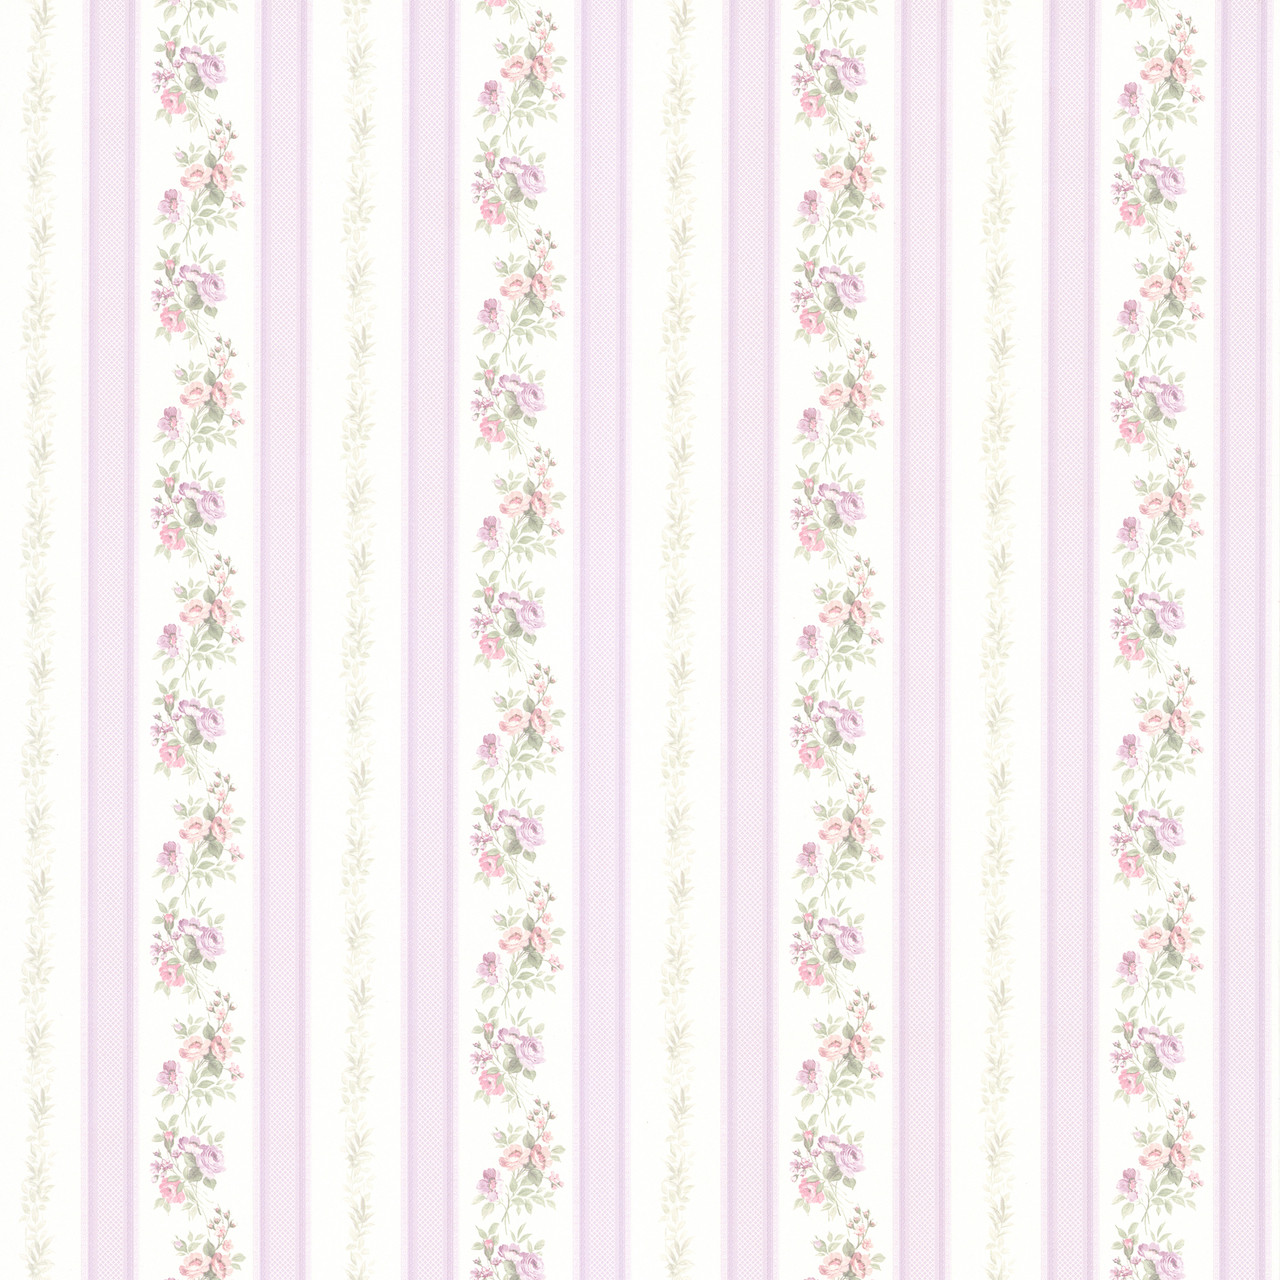 414 56030 Princess Lavender Floral Stripe Wallpaper